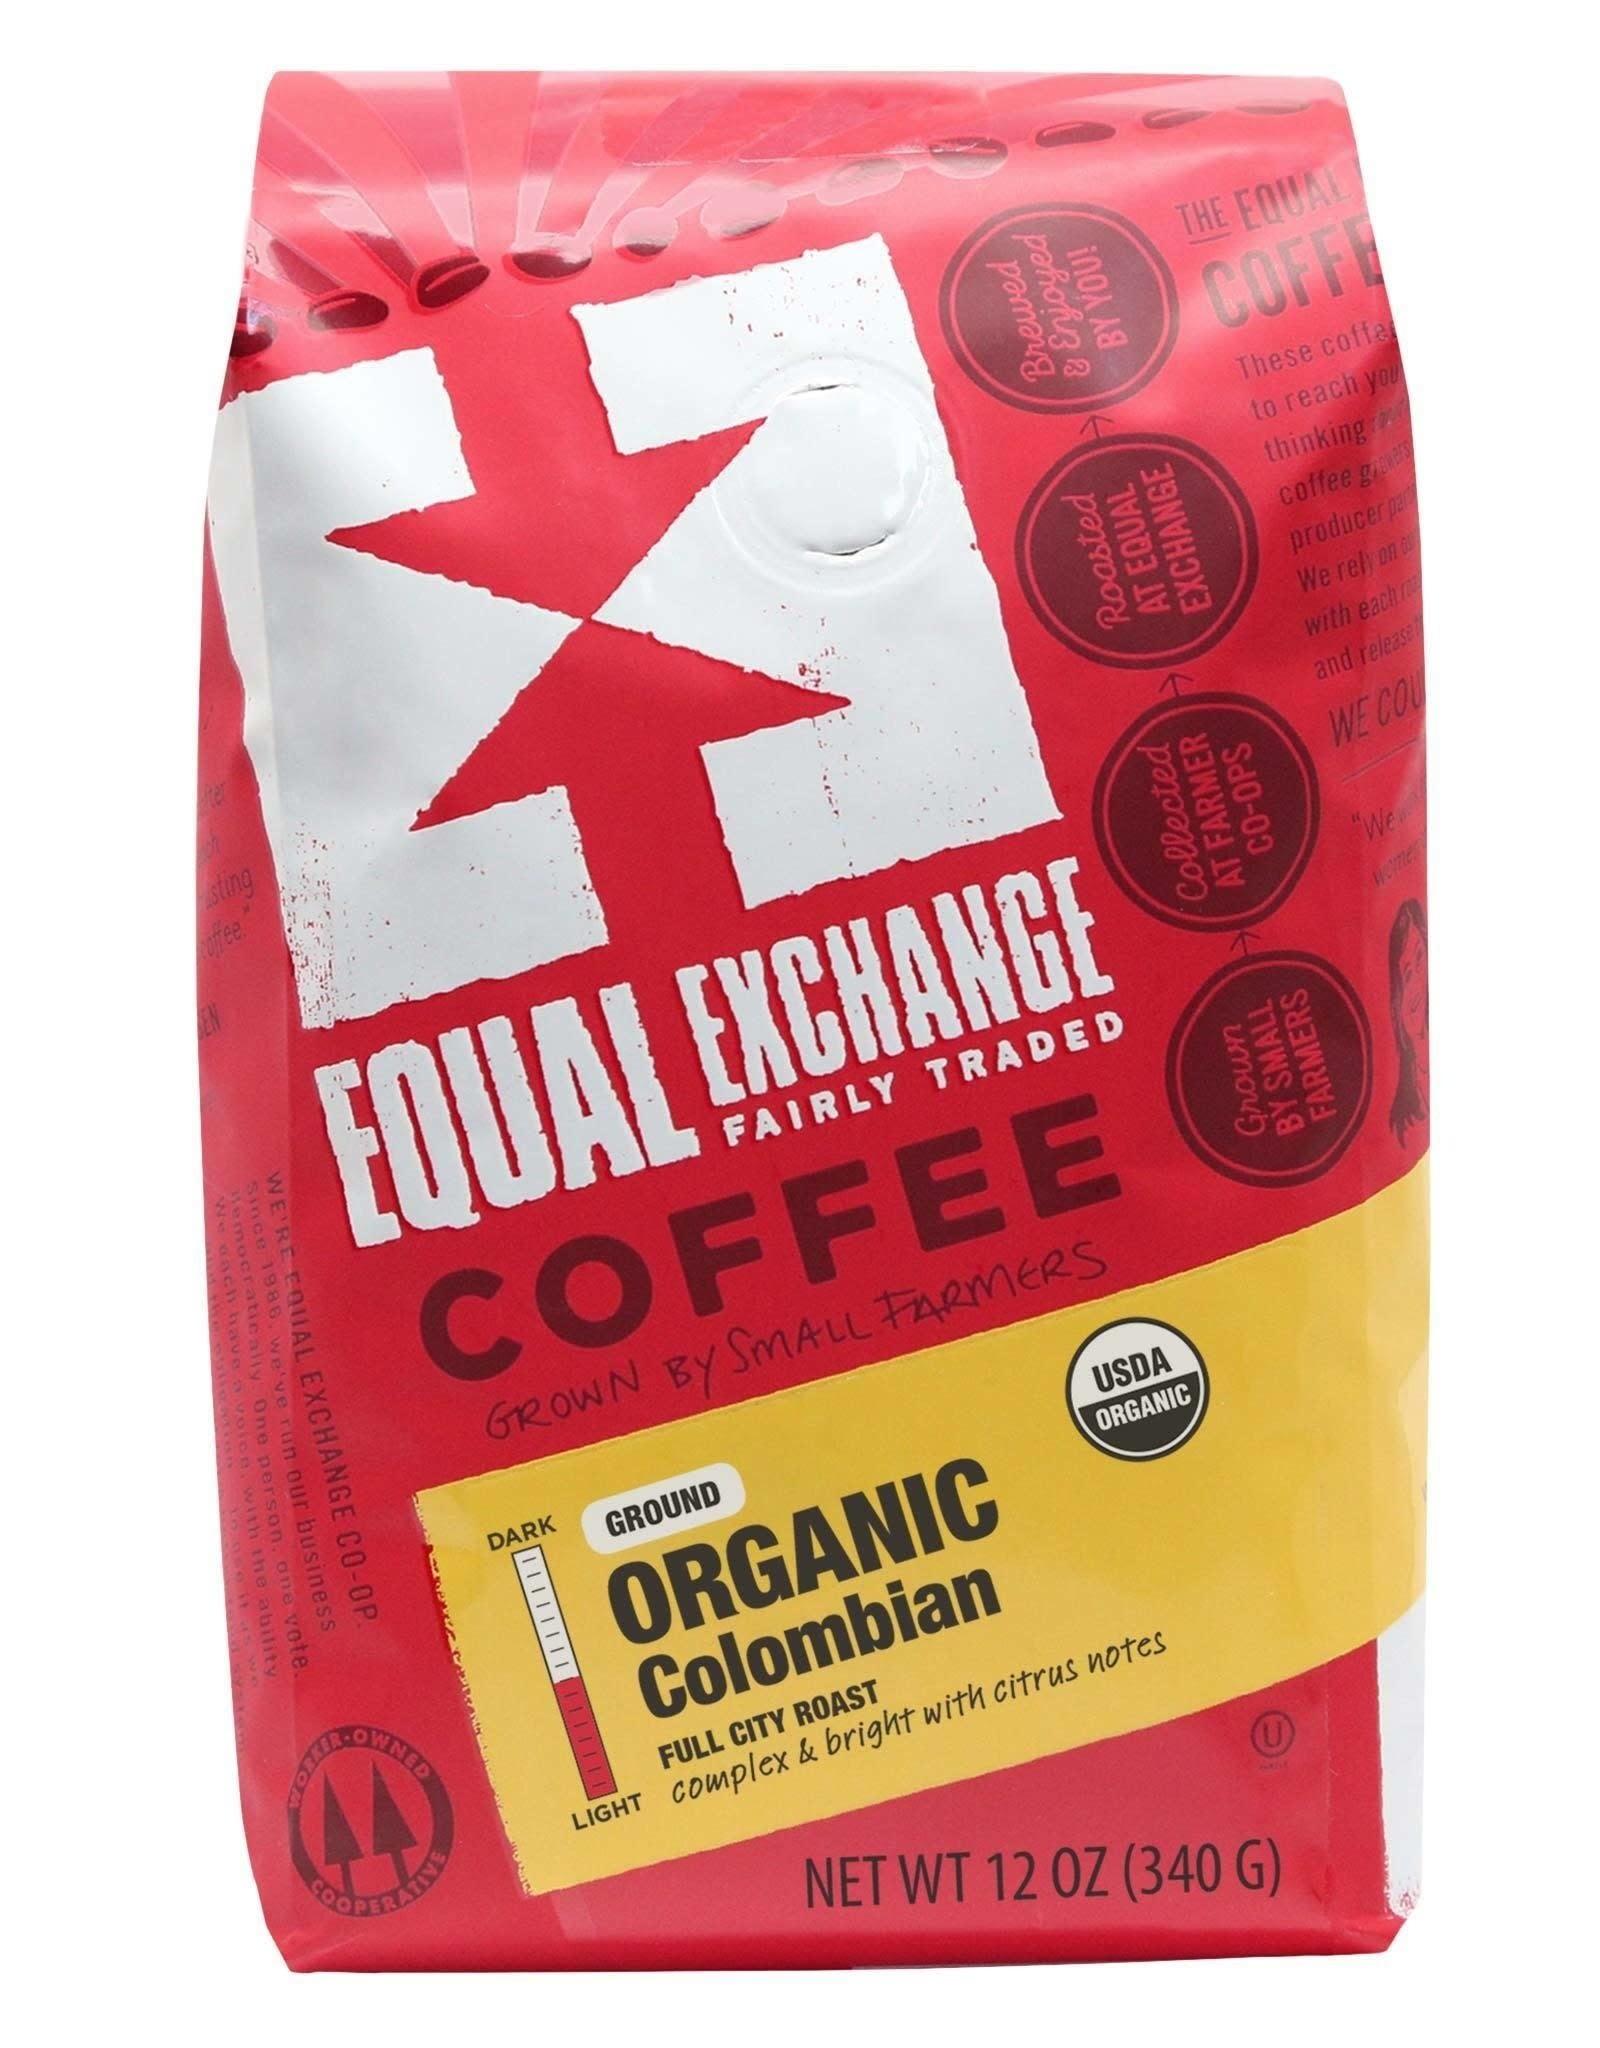 Organic Colombian Coffee, 12 oz, Ground